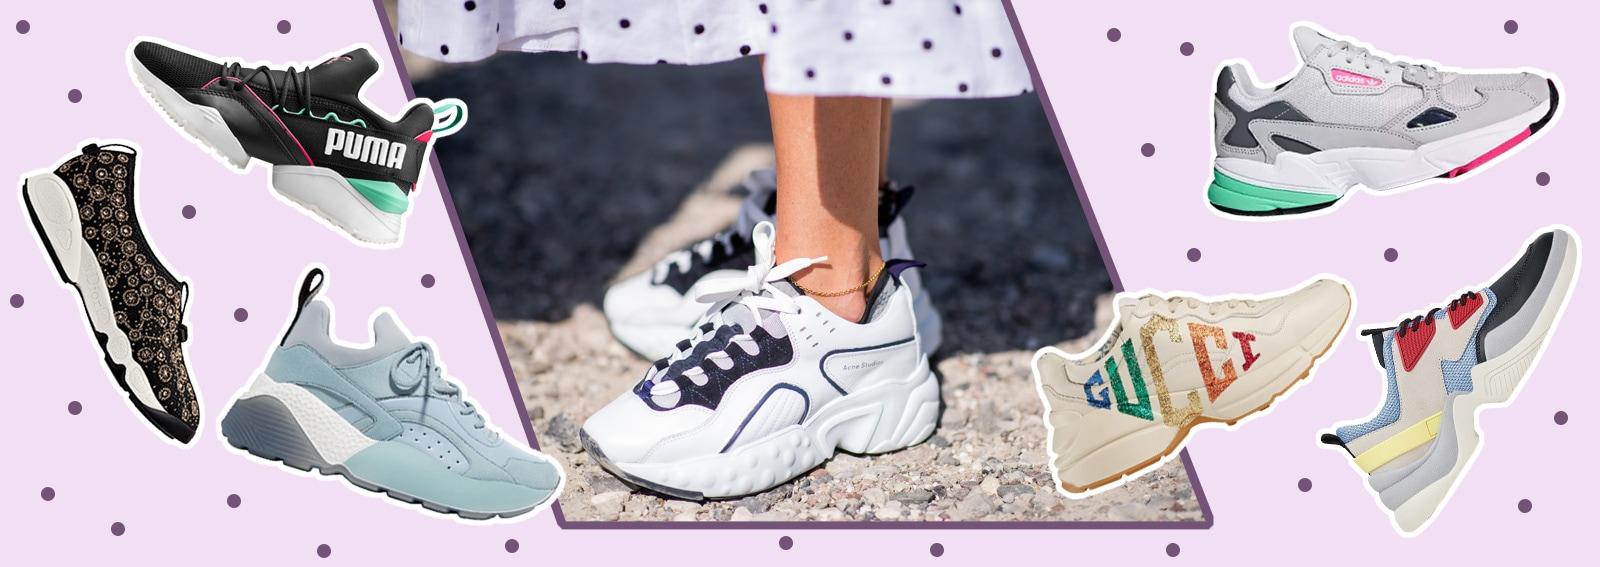 DESKTOP_Chuncky_sneakers